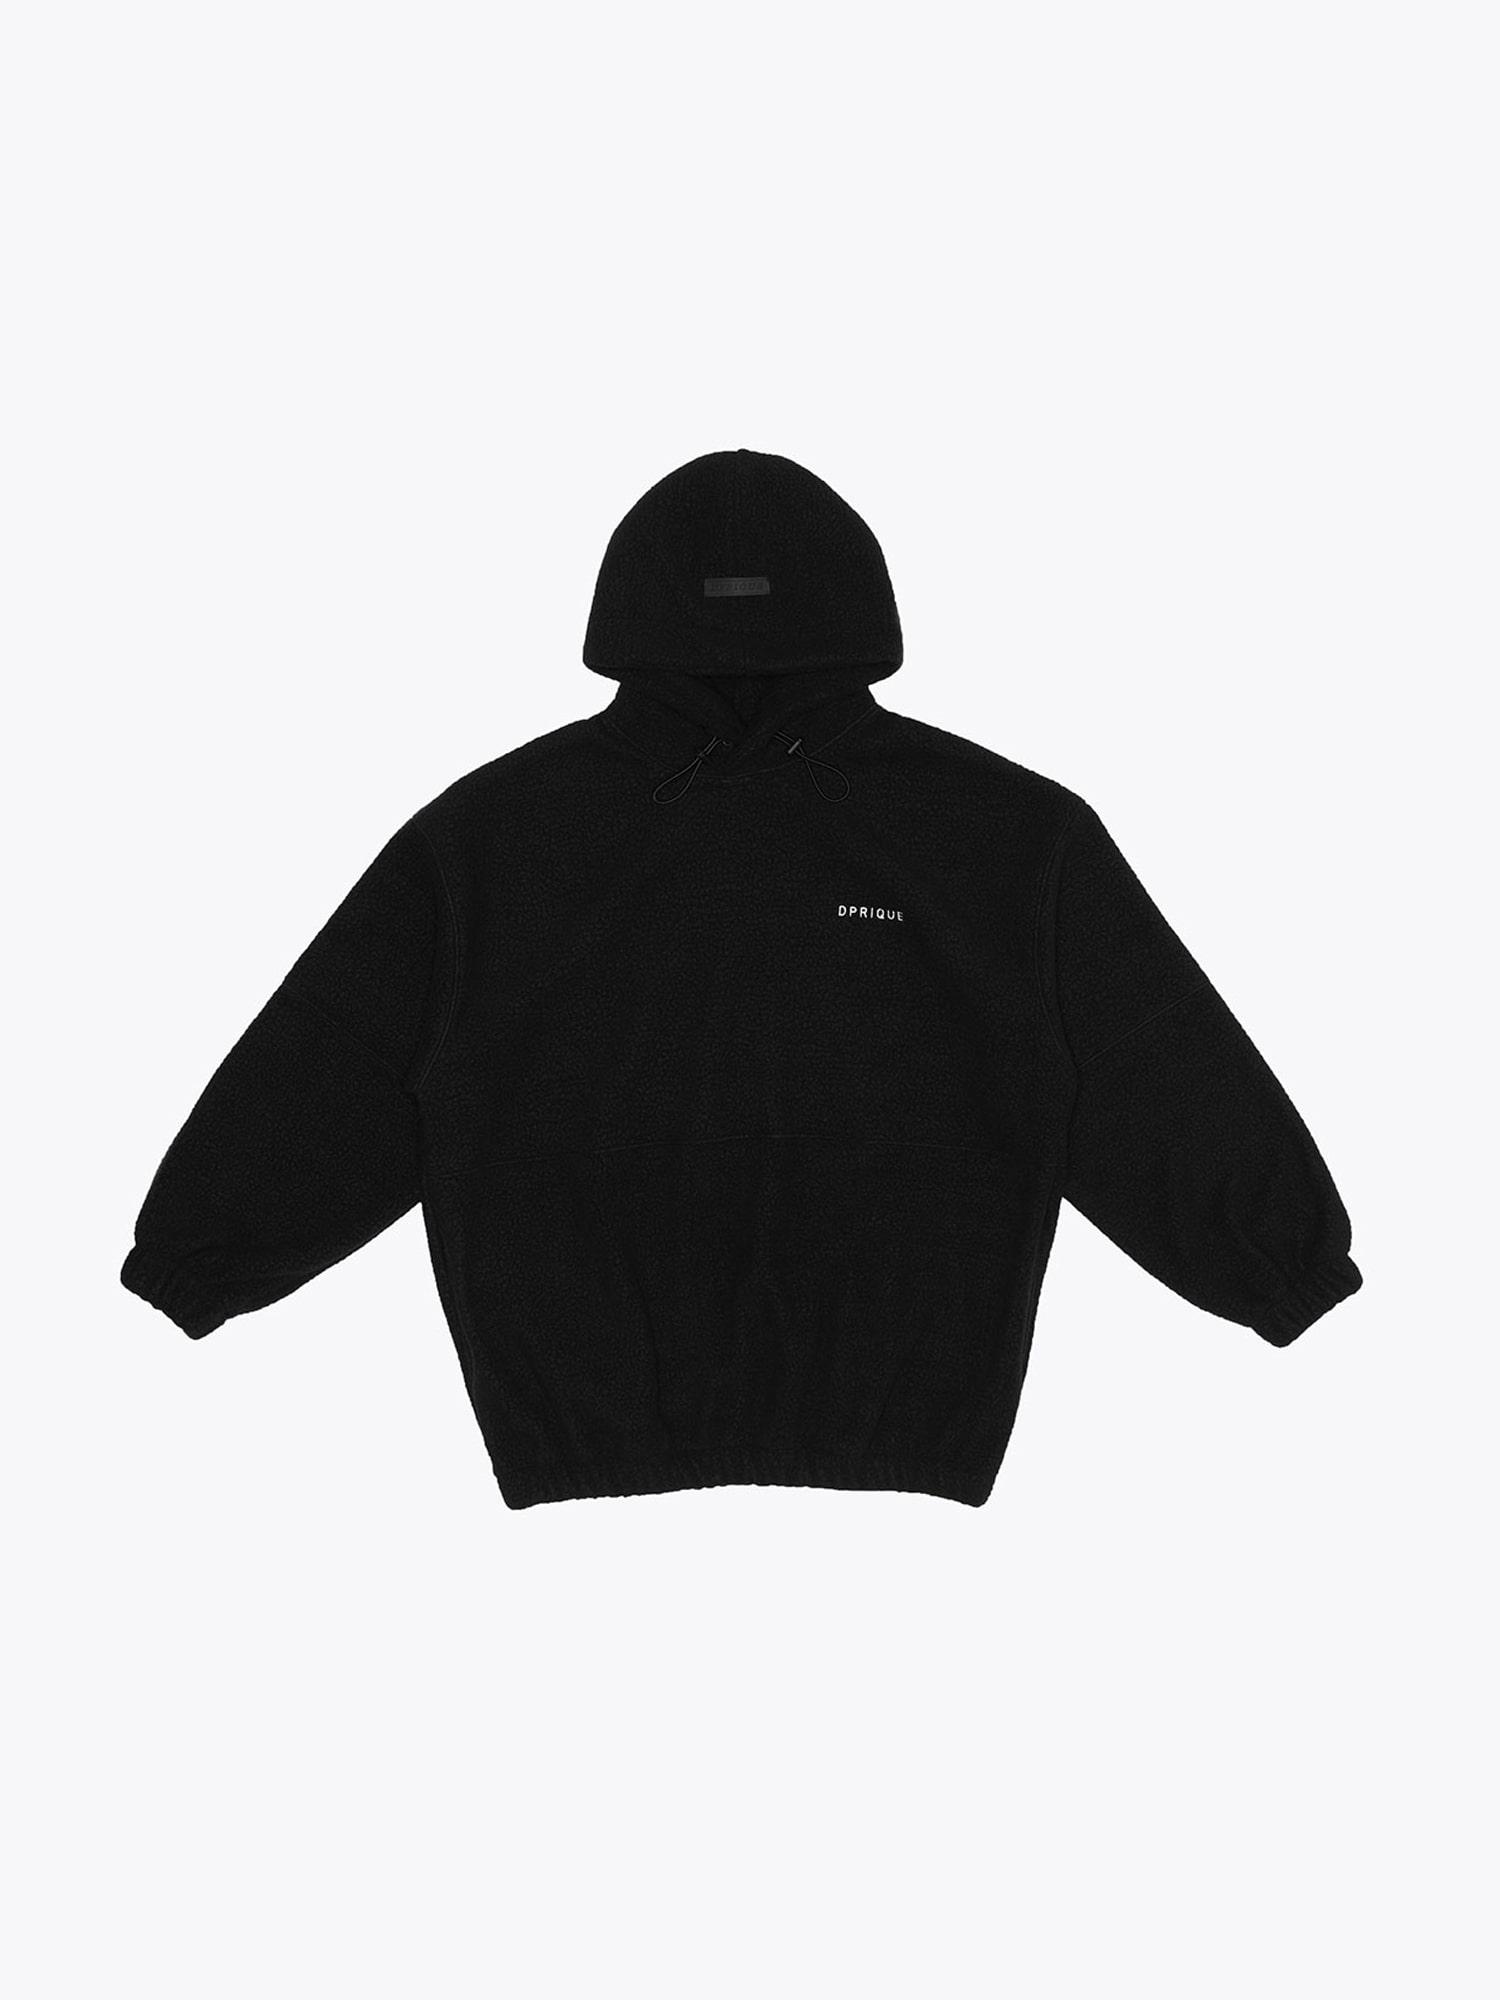 Oversized Fleece Hoodie - Black